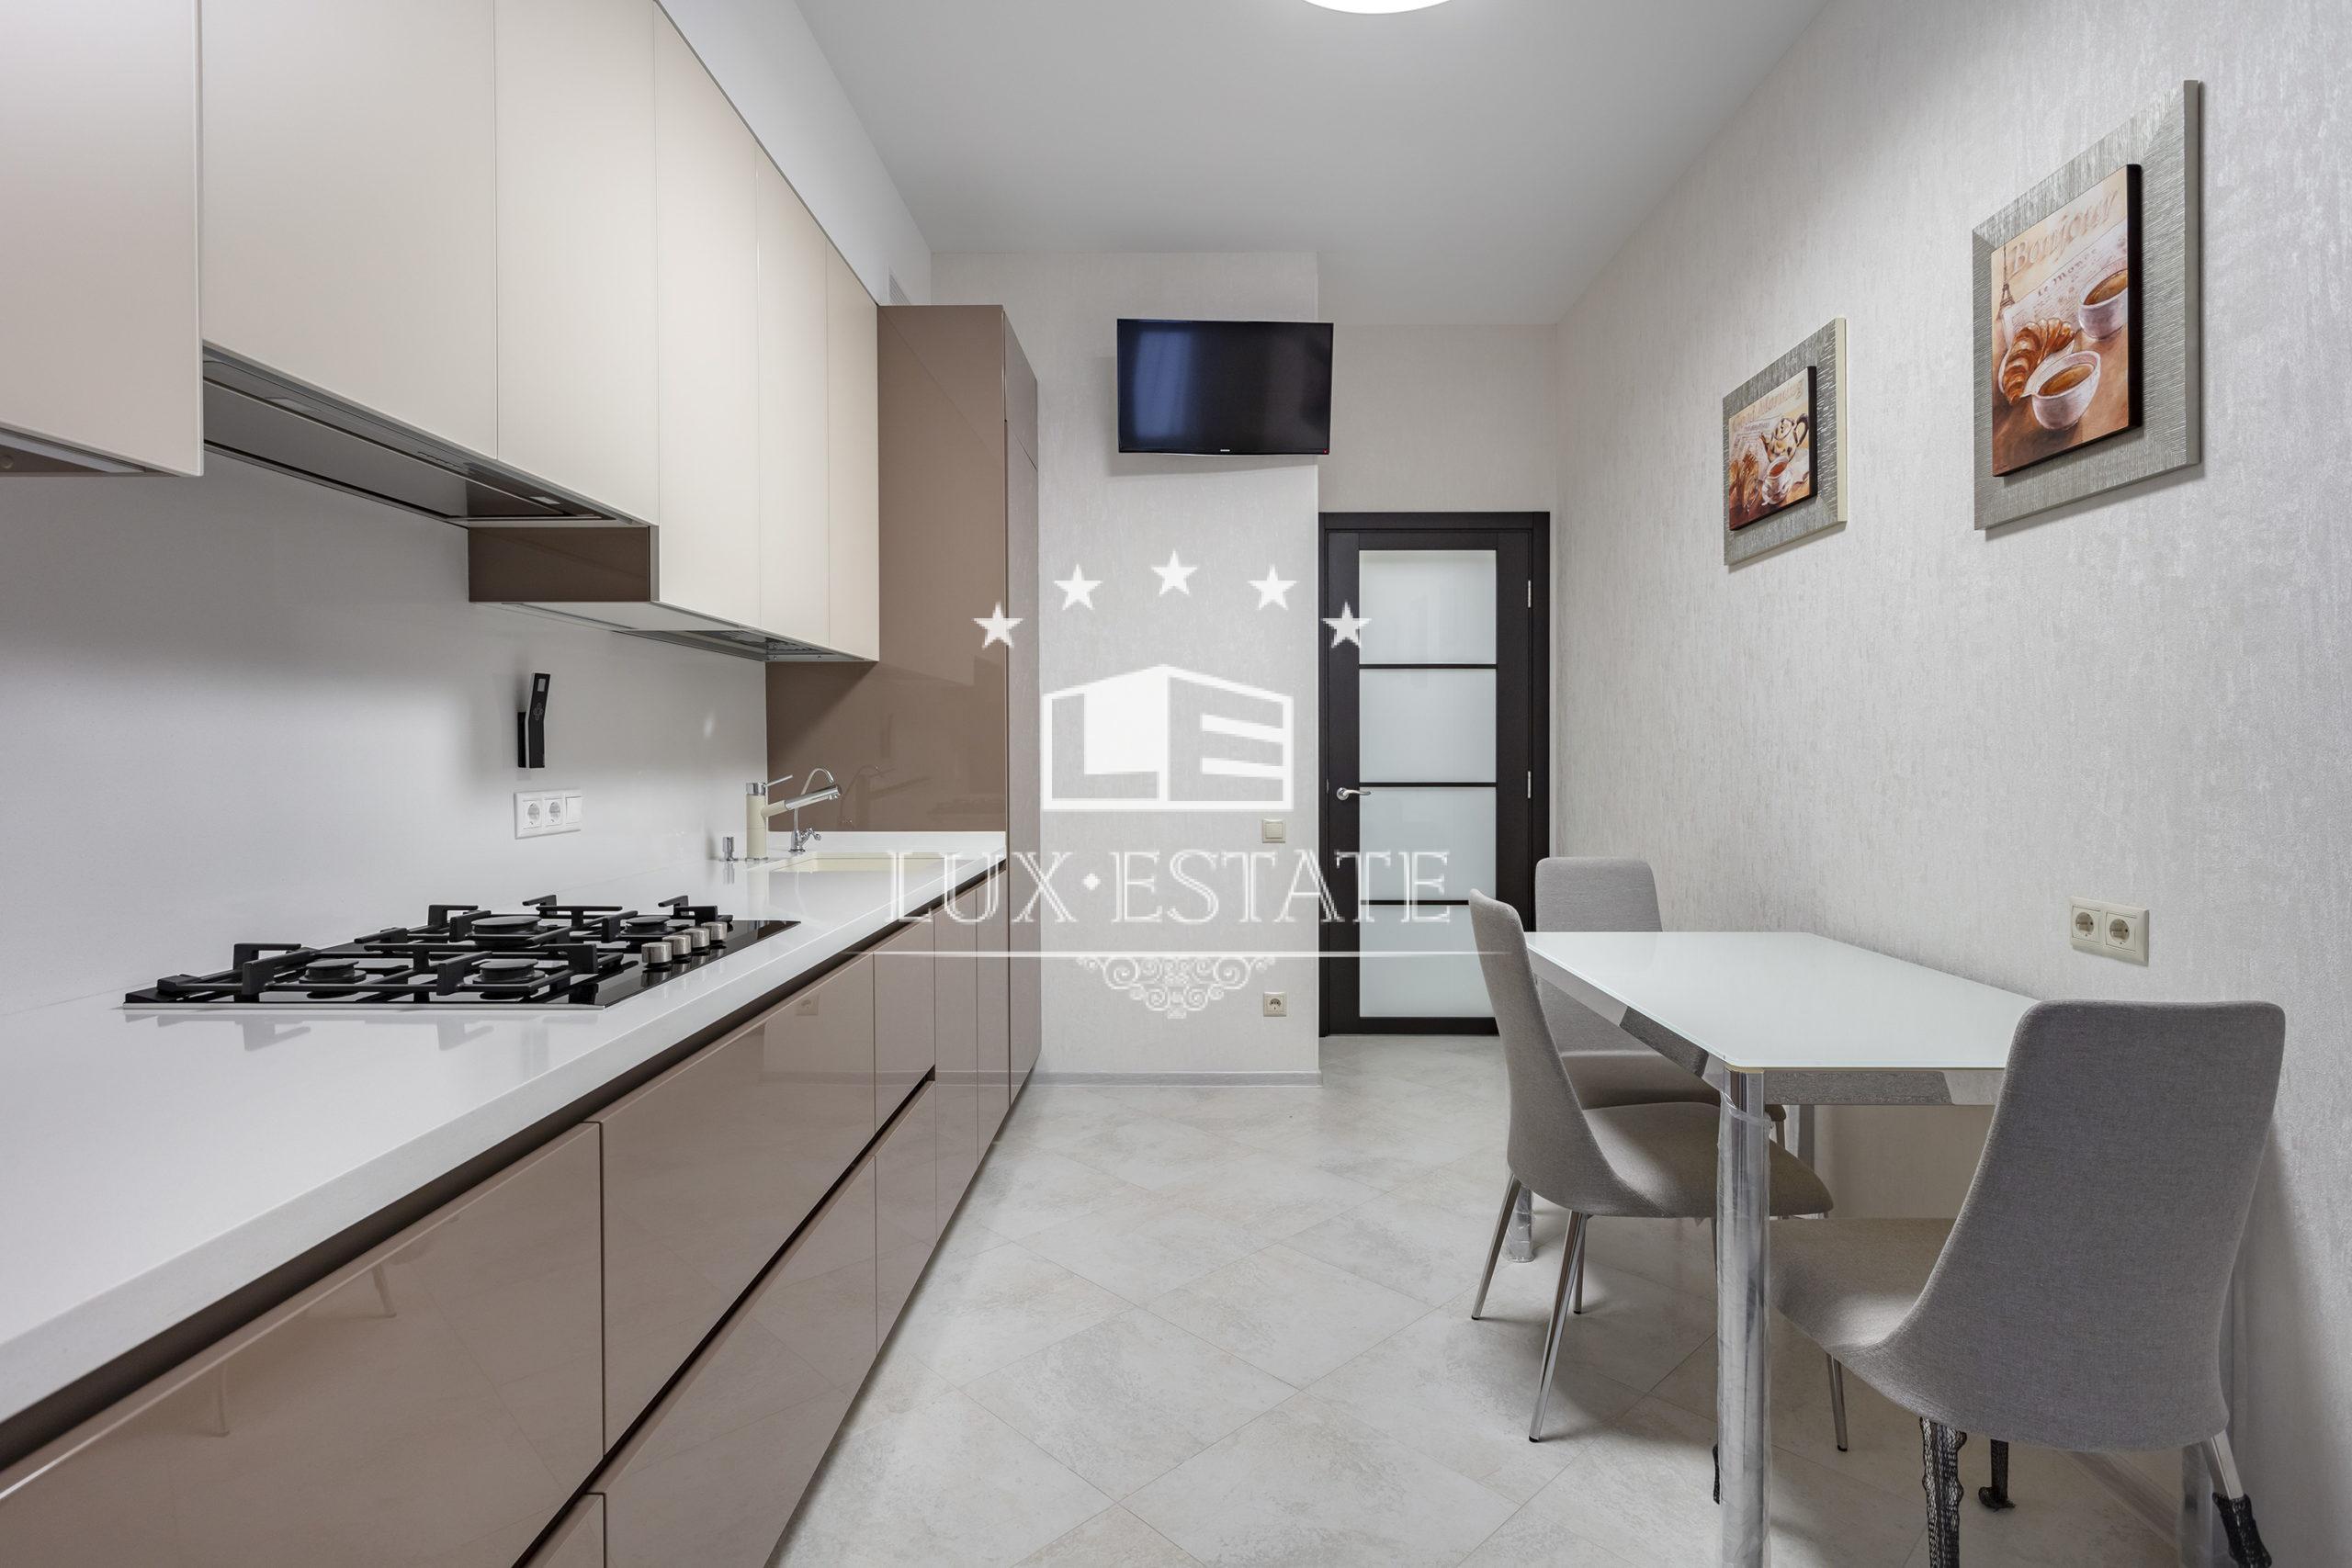 Однокомнатная квартира в элитном доме ул. Бакулина,33